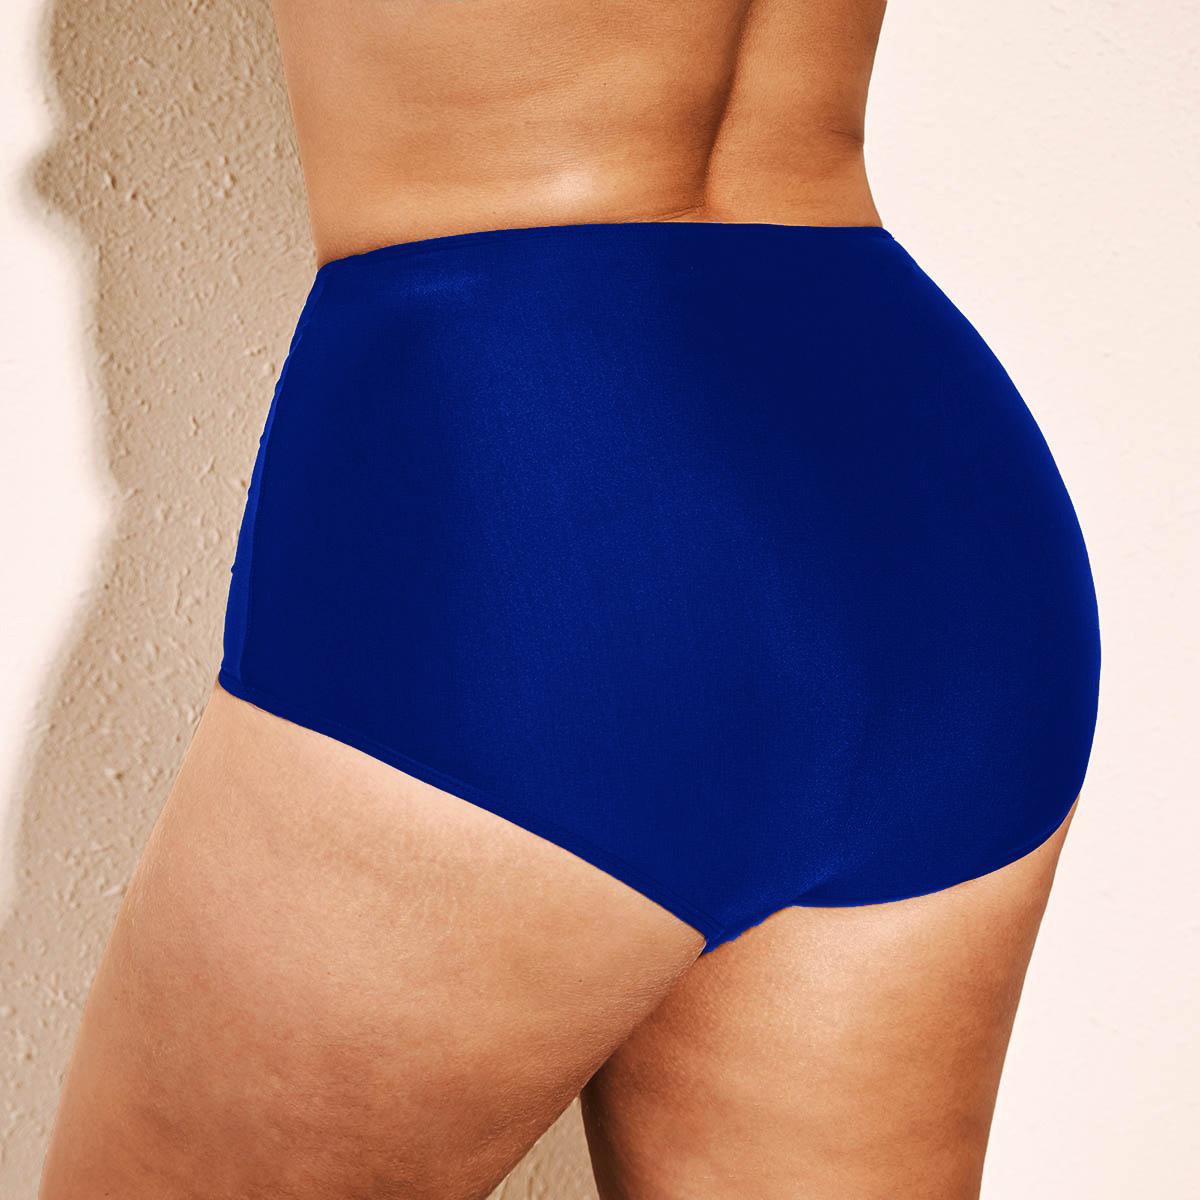 Blue Plus Size High Waist Swimwear Panty